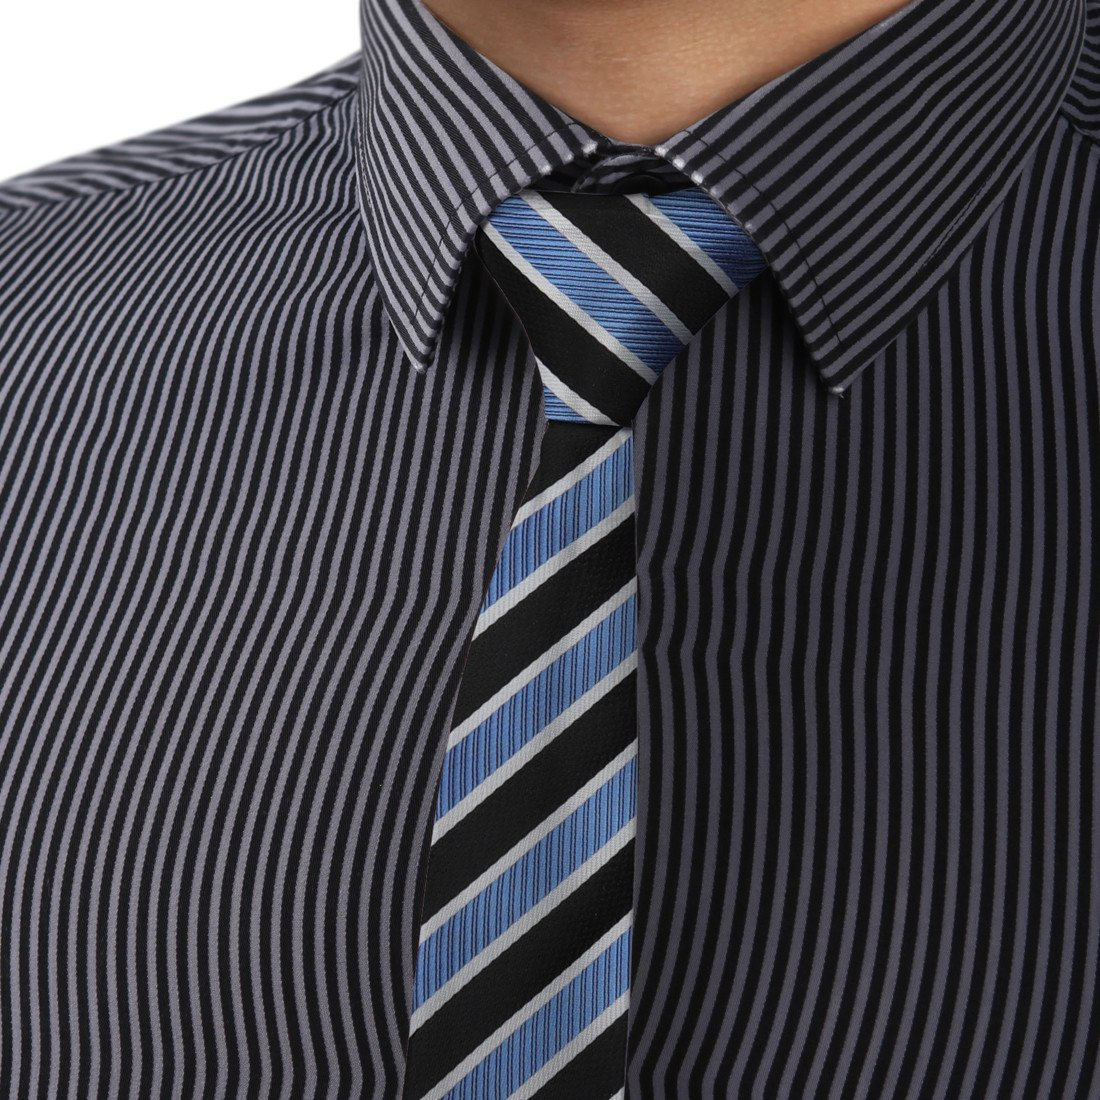 Dan Smith Dae7a06e Black Cornflower Blue Stripes Microfiber Skinny